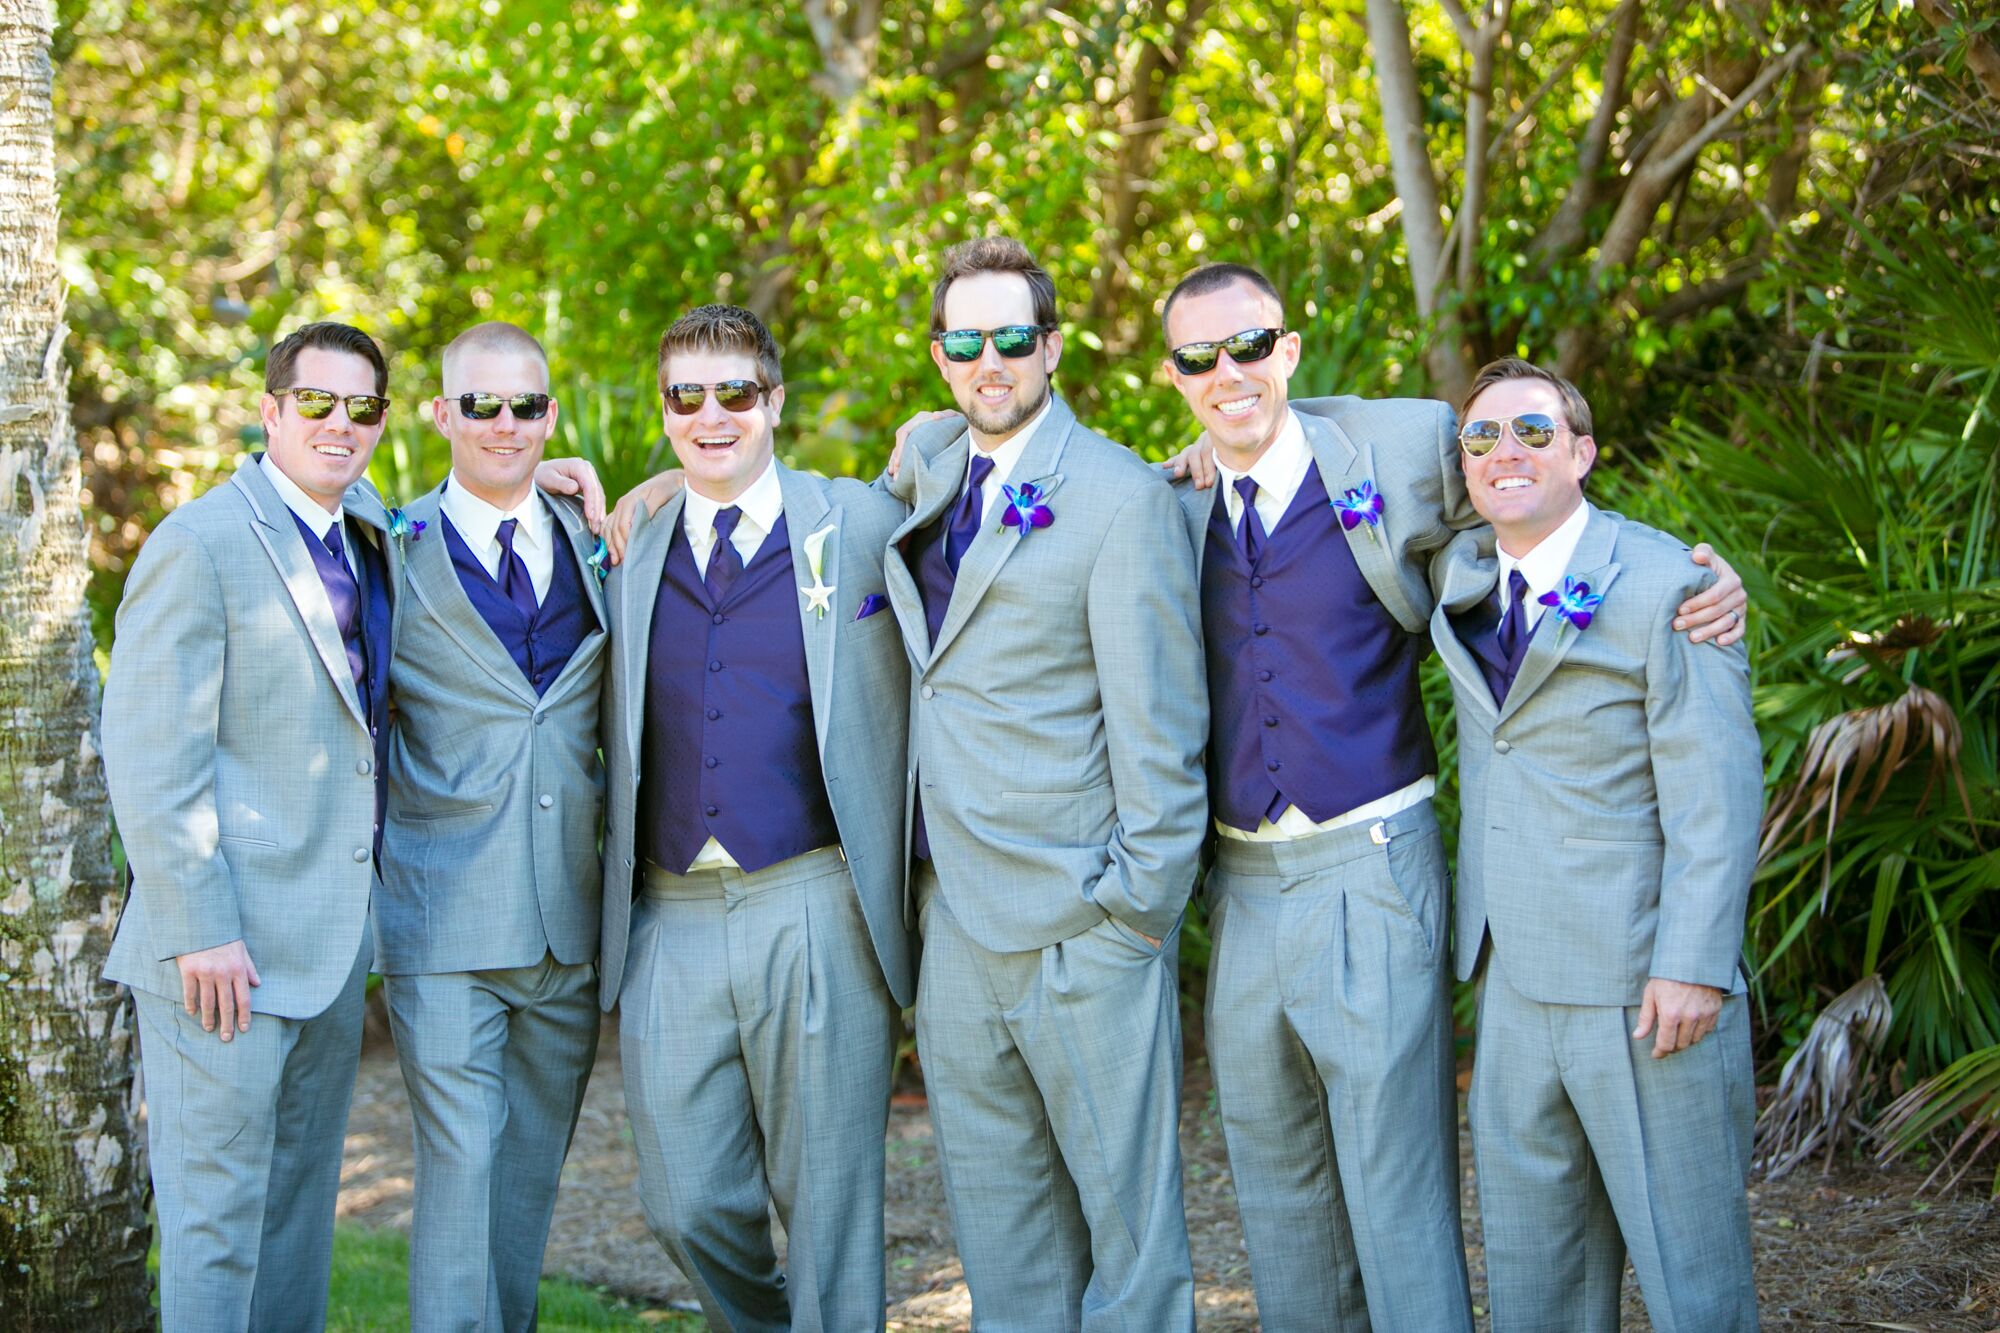 Purple and Light Gray Groomsmen Suits